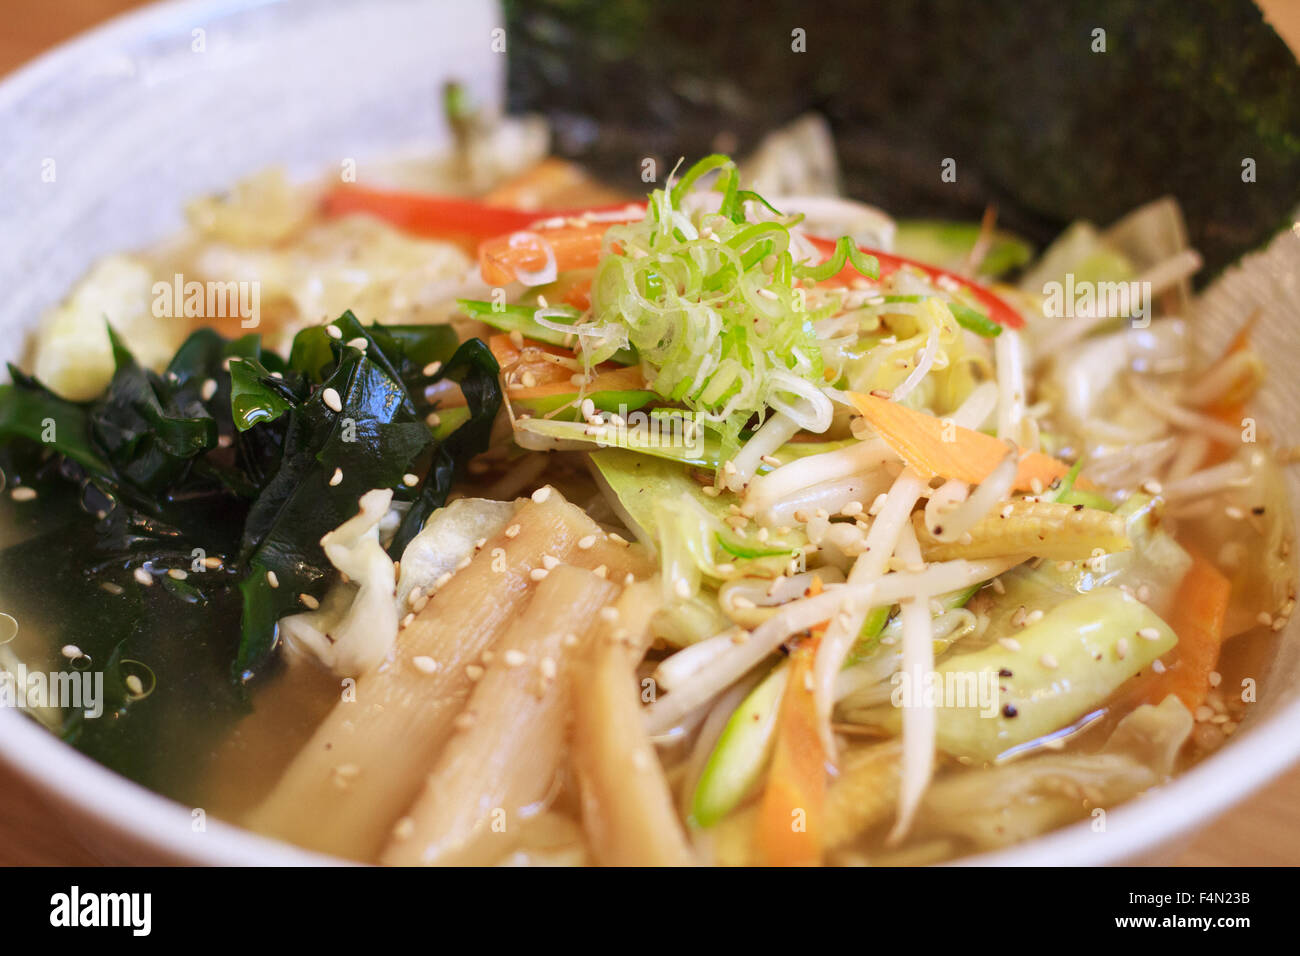 Japanese Vegetable based Ramen noodles - Stock Image